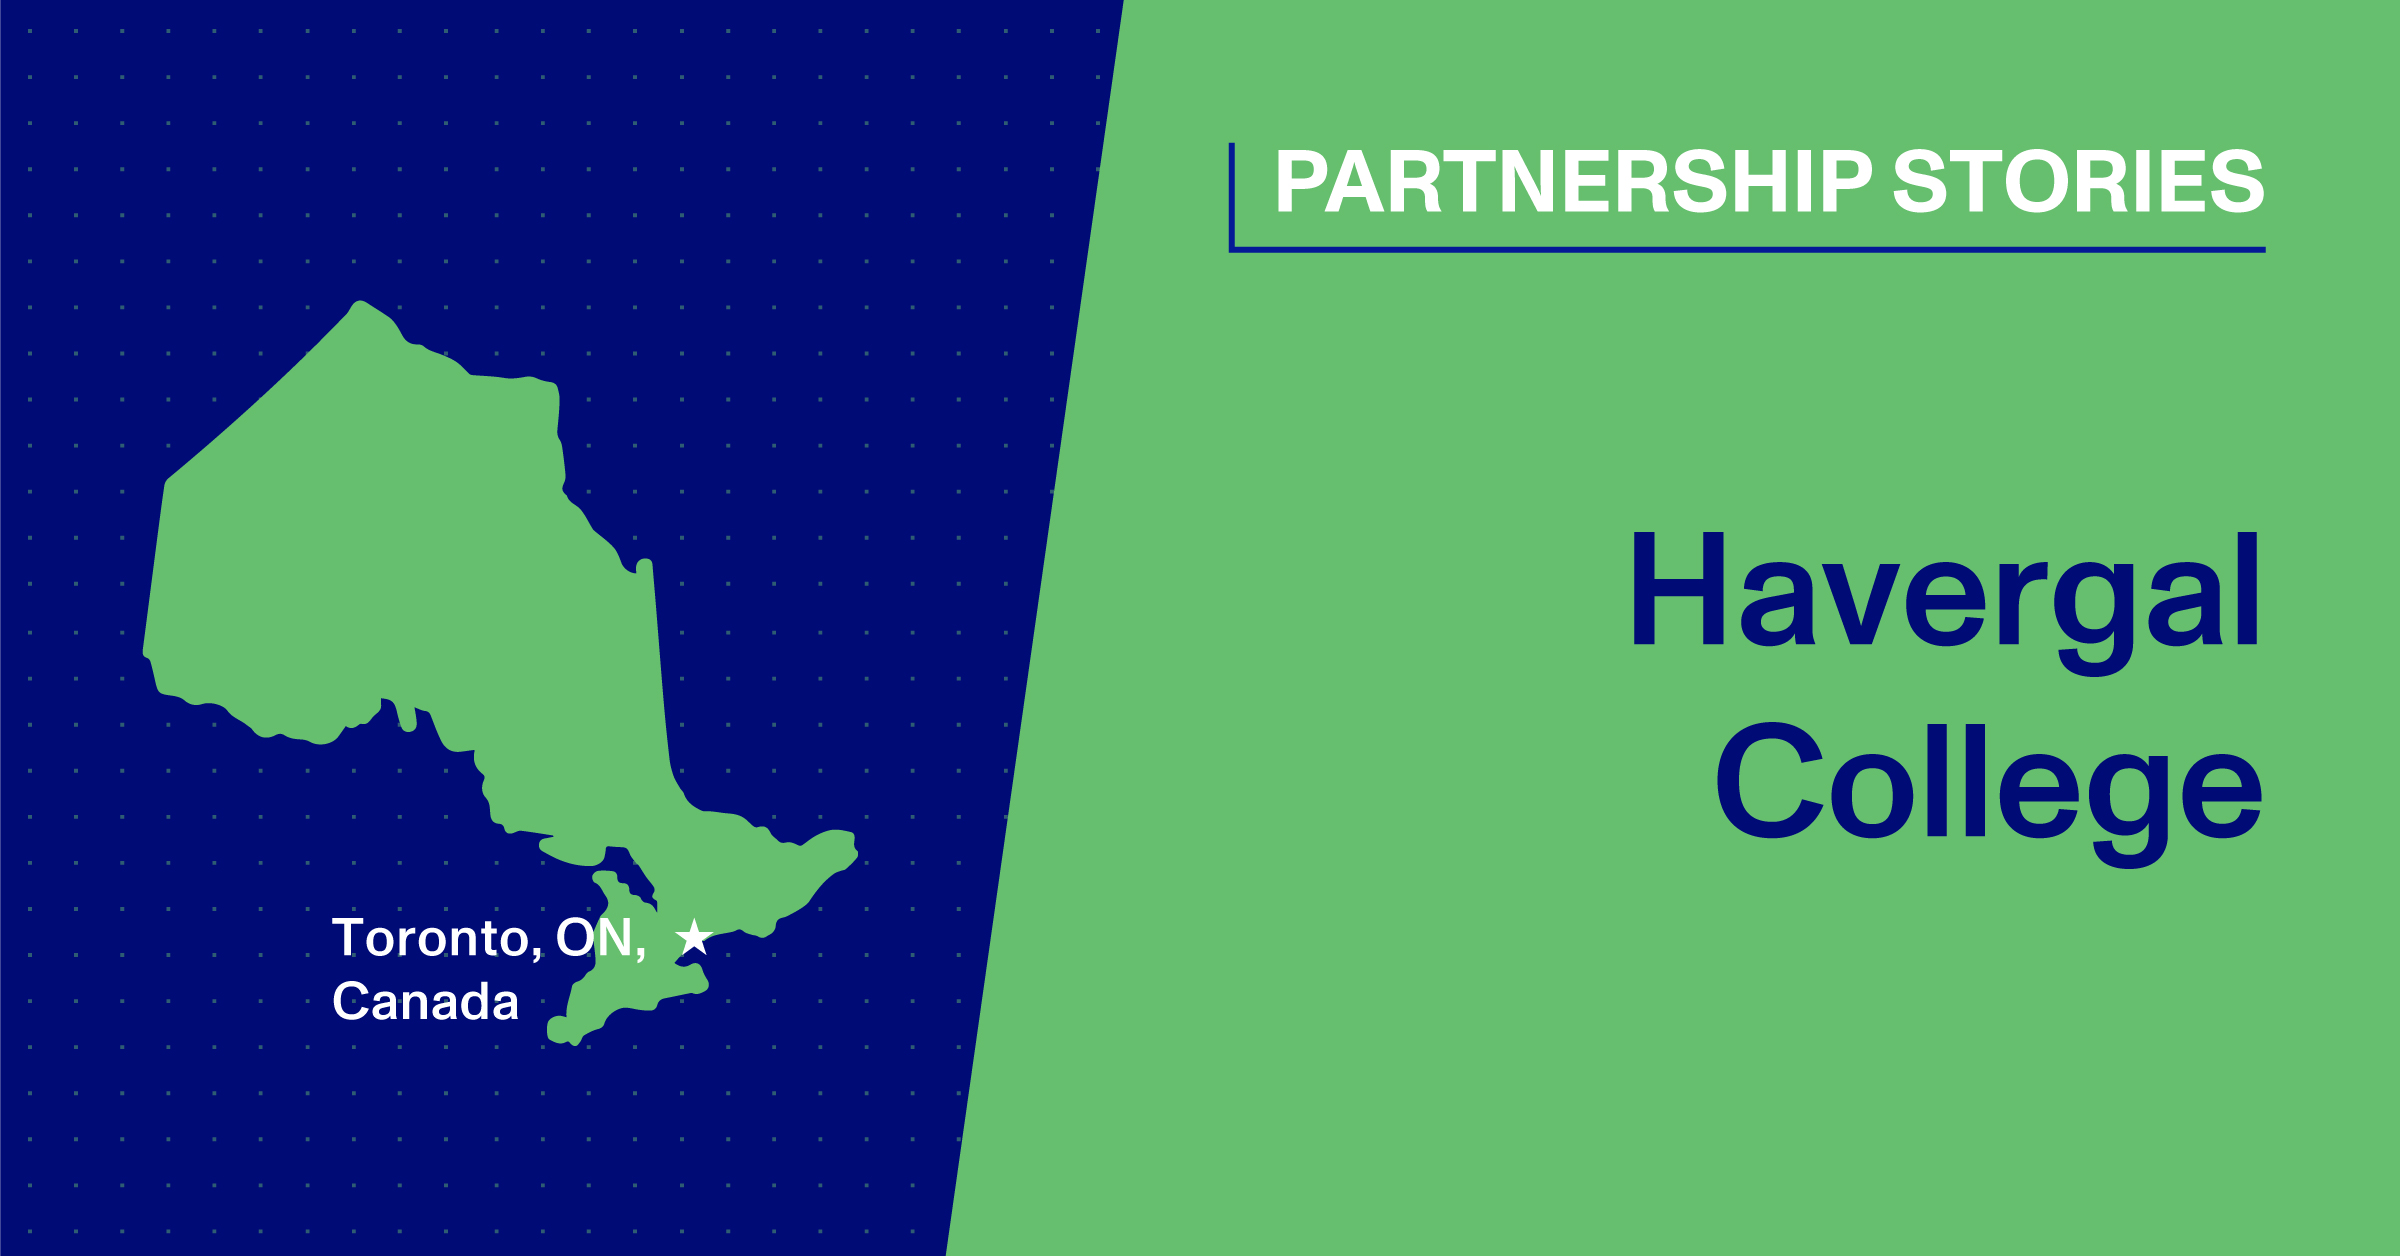 Havergal College in Toronto, Canada